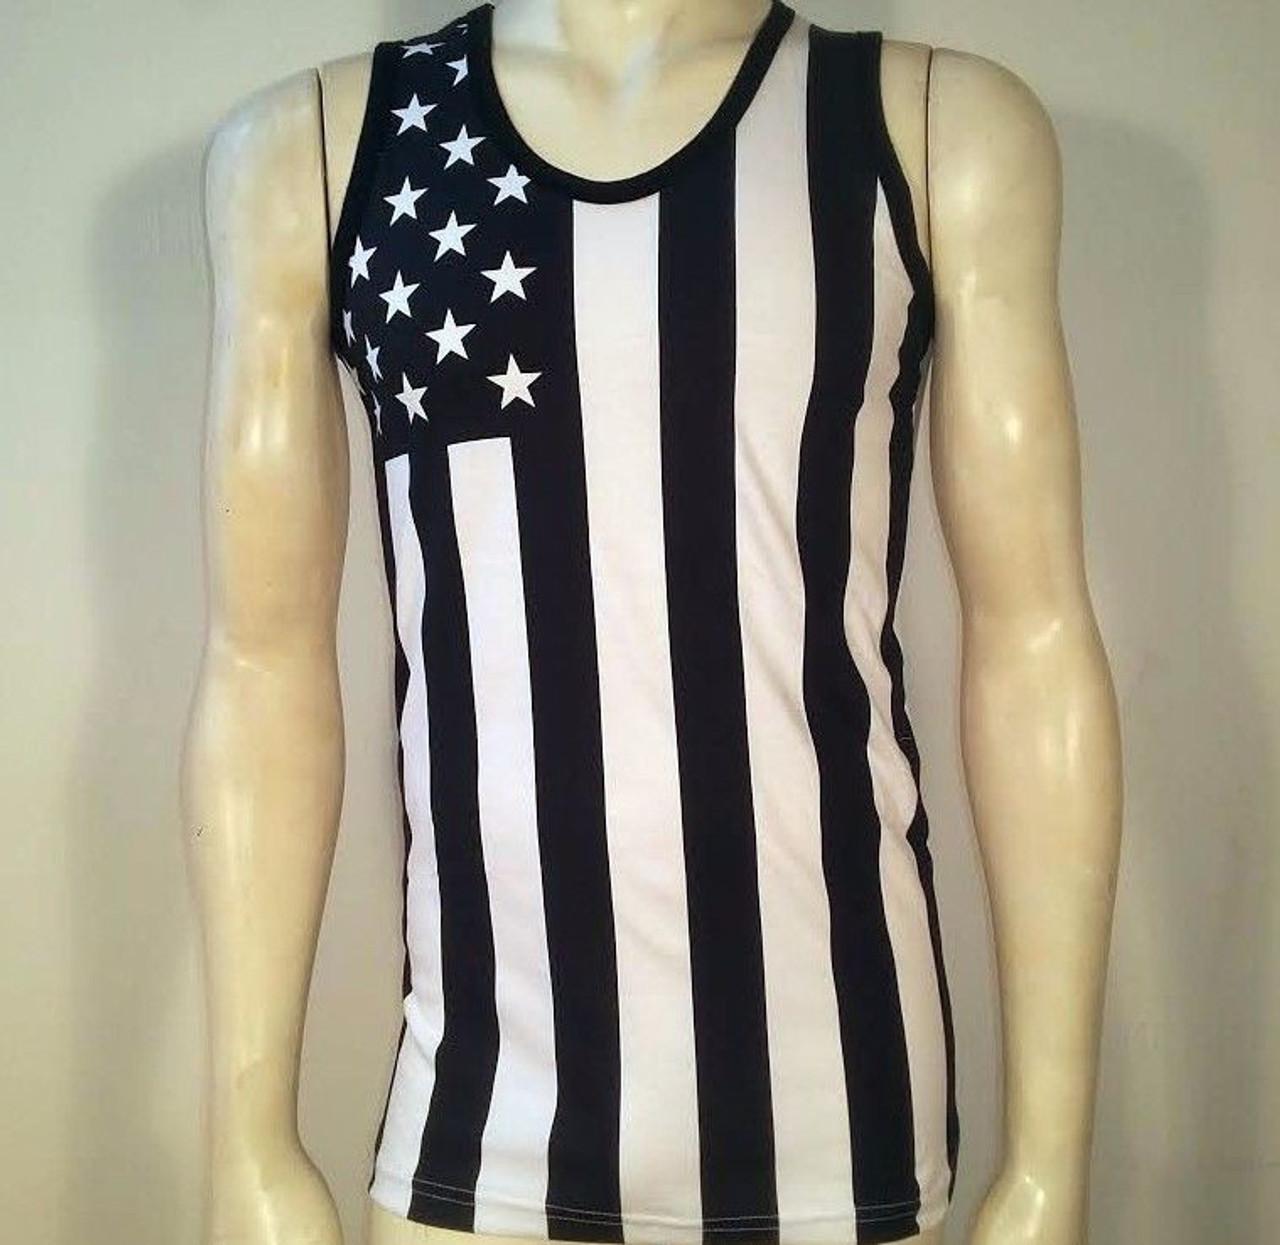 0aadabeb USA Black & White Flag American Patriotic Stars Army Mens Tank Top Shirt  MUHUBW - Fearless Apparel